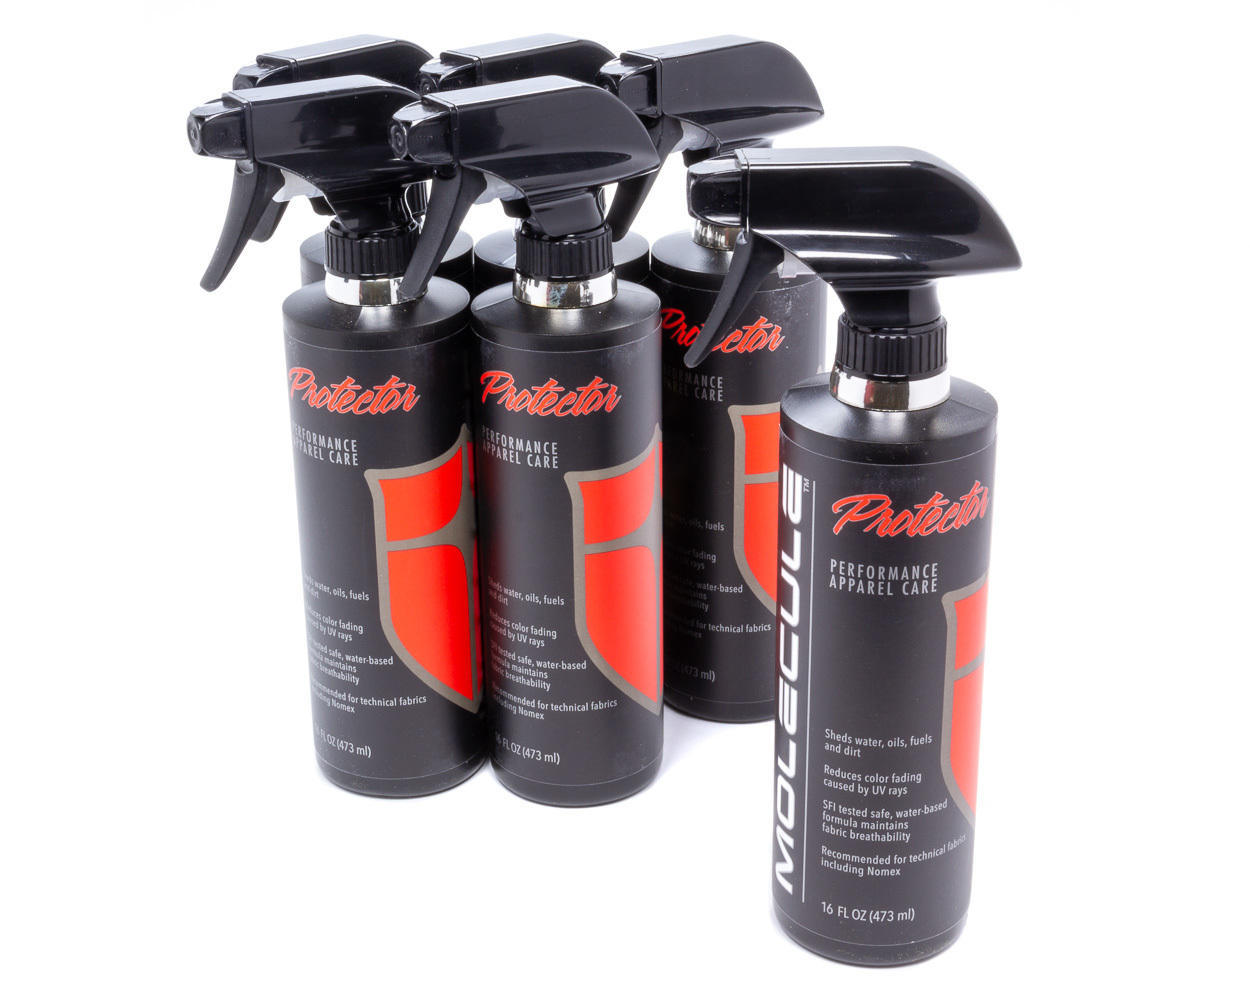 Protector 16oz Spray Case of 6